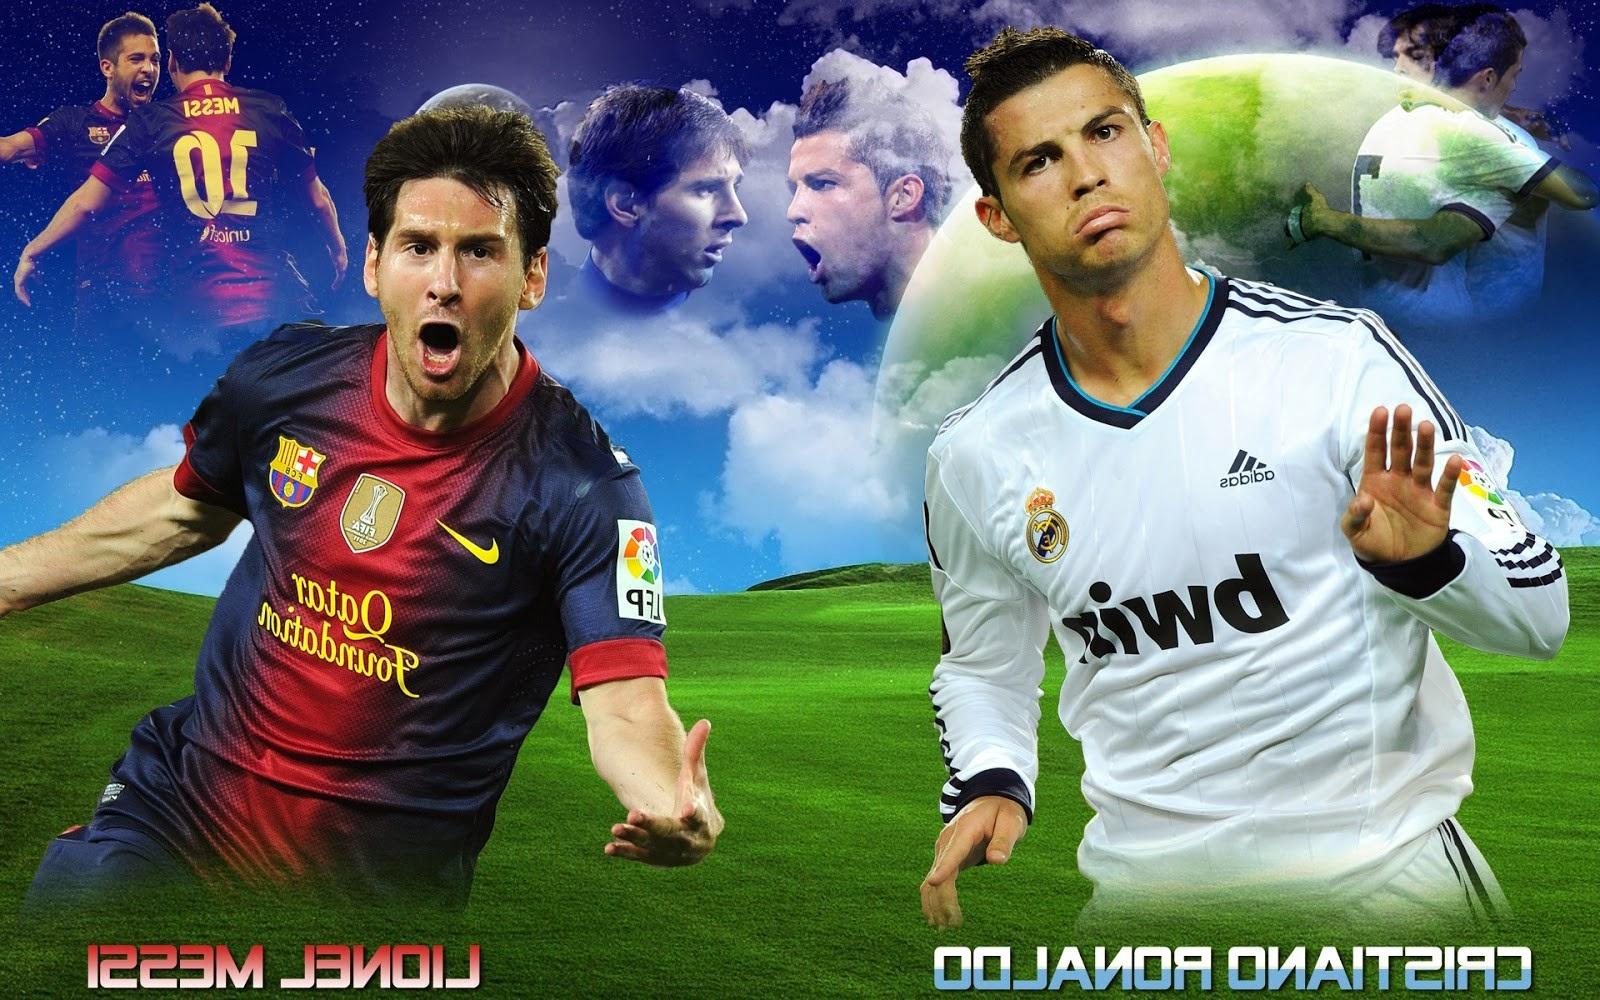 Ronaldo Vs Messi New HD Wallpaper 2014 | World Fresh HD ...